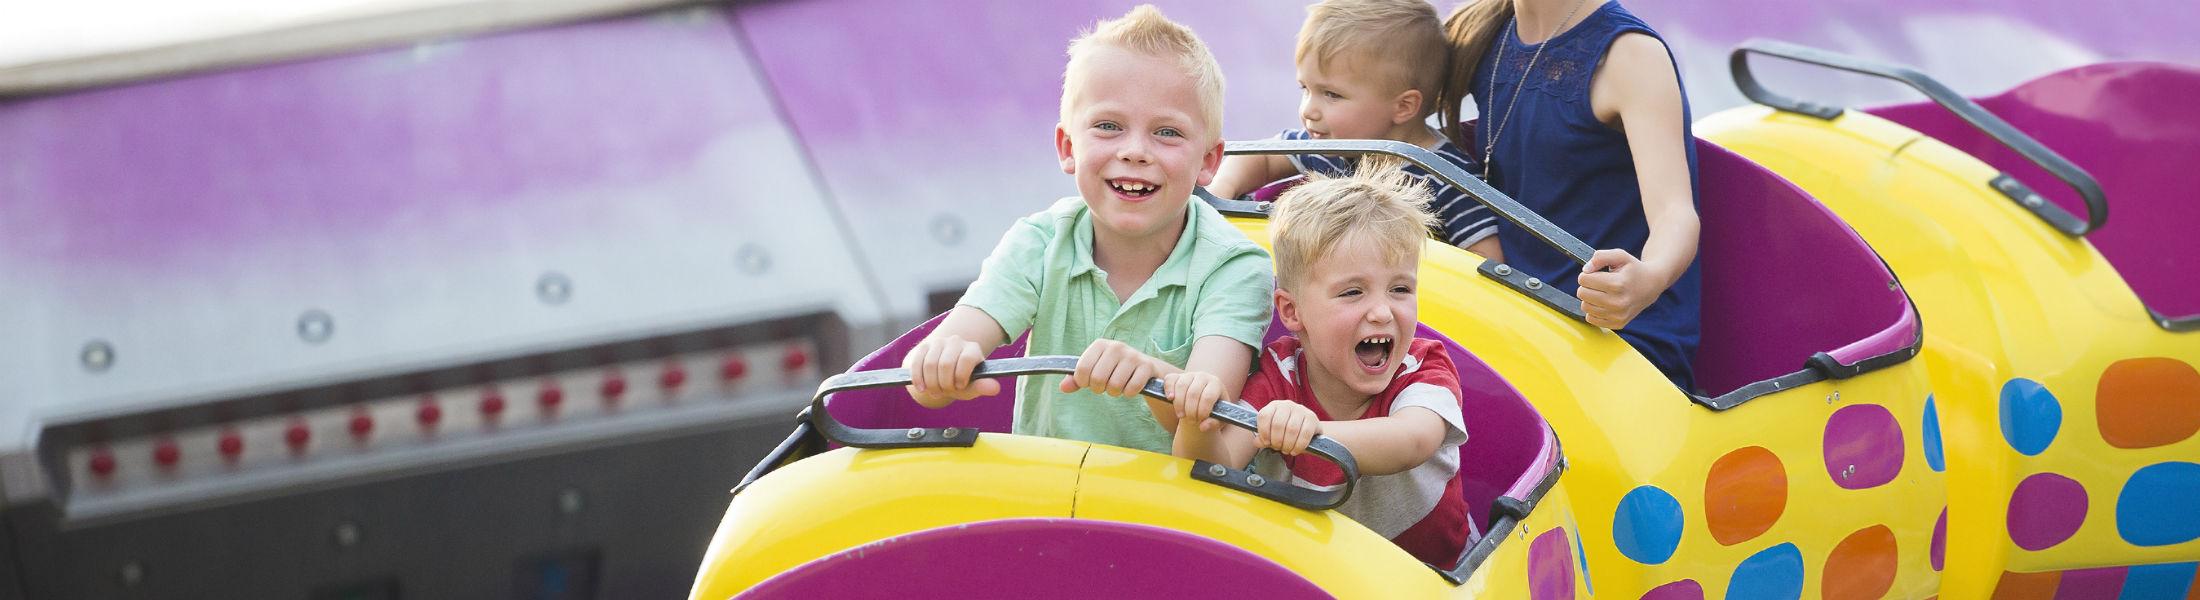 Roller coaster ride at an amusement park